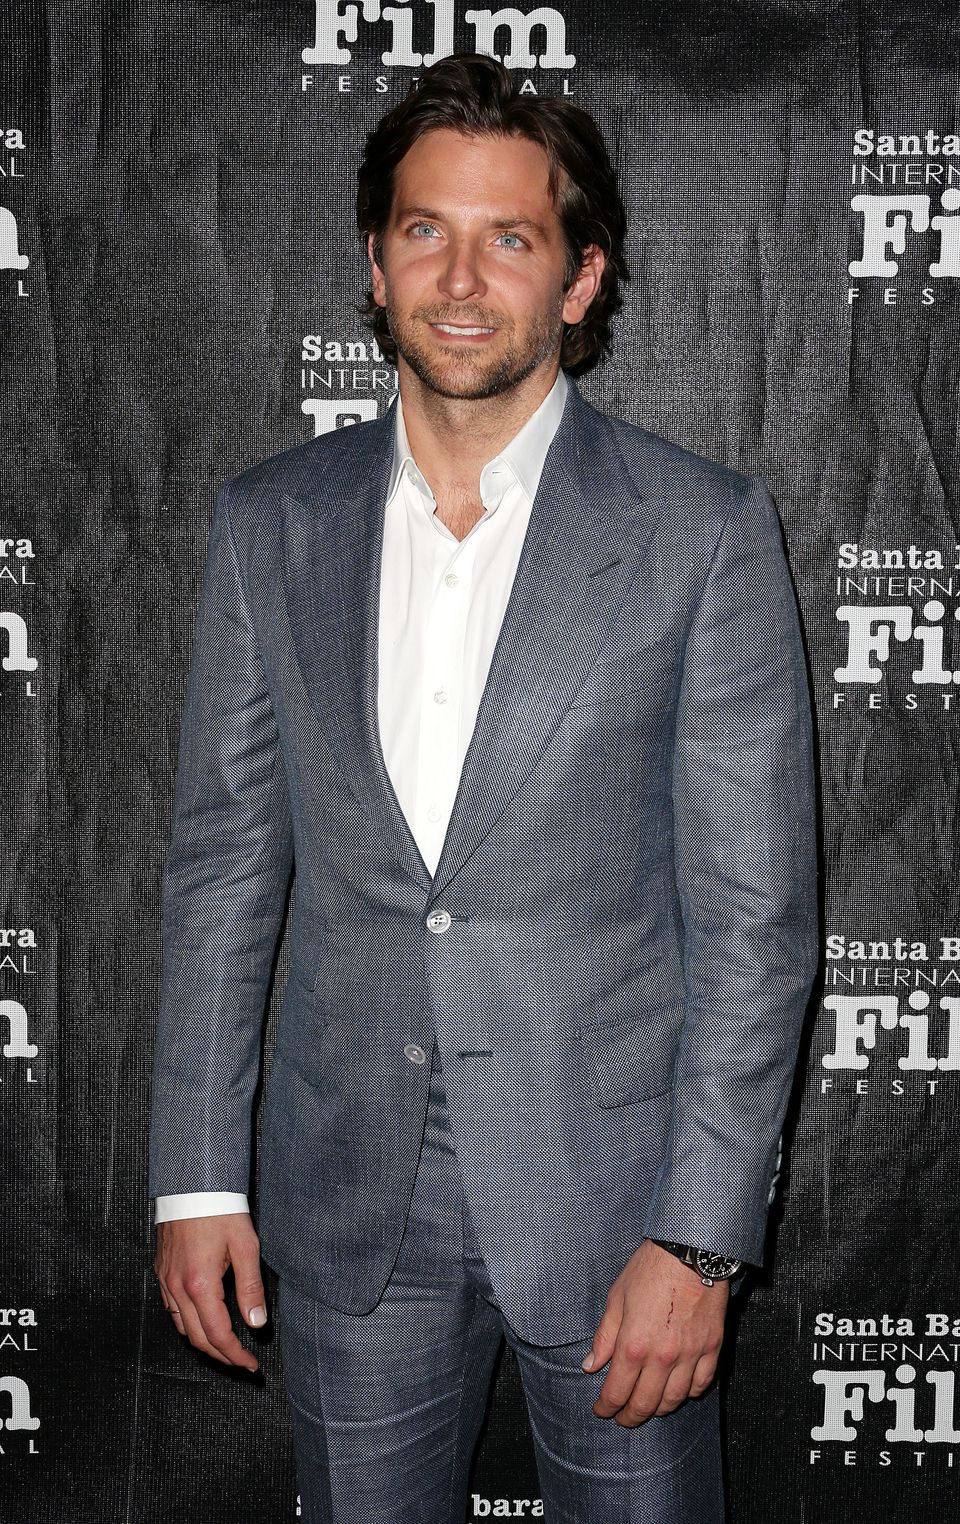 "Cooper became sober at 29 after <a href=""http://www.hollywoodreporter.com/news/bradley-cooper-evolution-leading-man-the-hango"